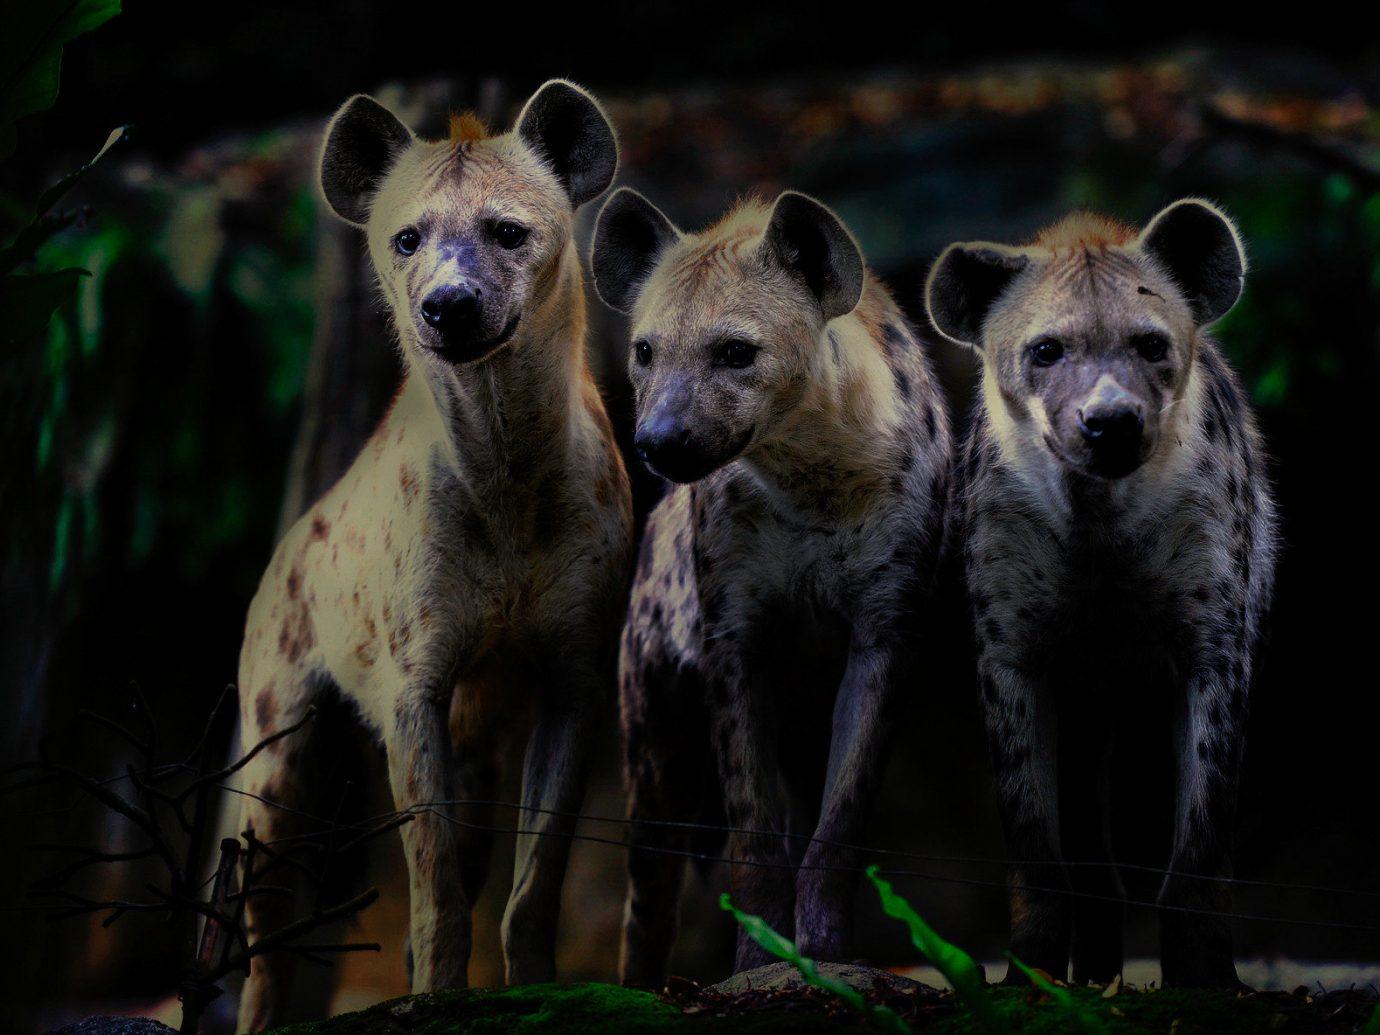 Arts + Culture Singapore Southeast Asia Trip Ideas hyena Wildlife mammal animal fauna standing terrestrial animal snout wild dog organism carnivoran